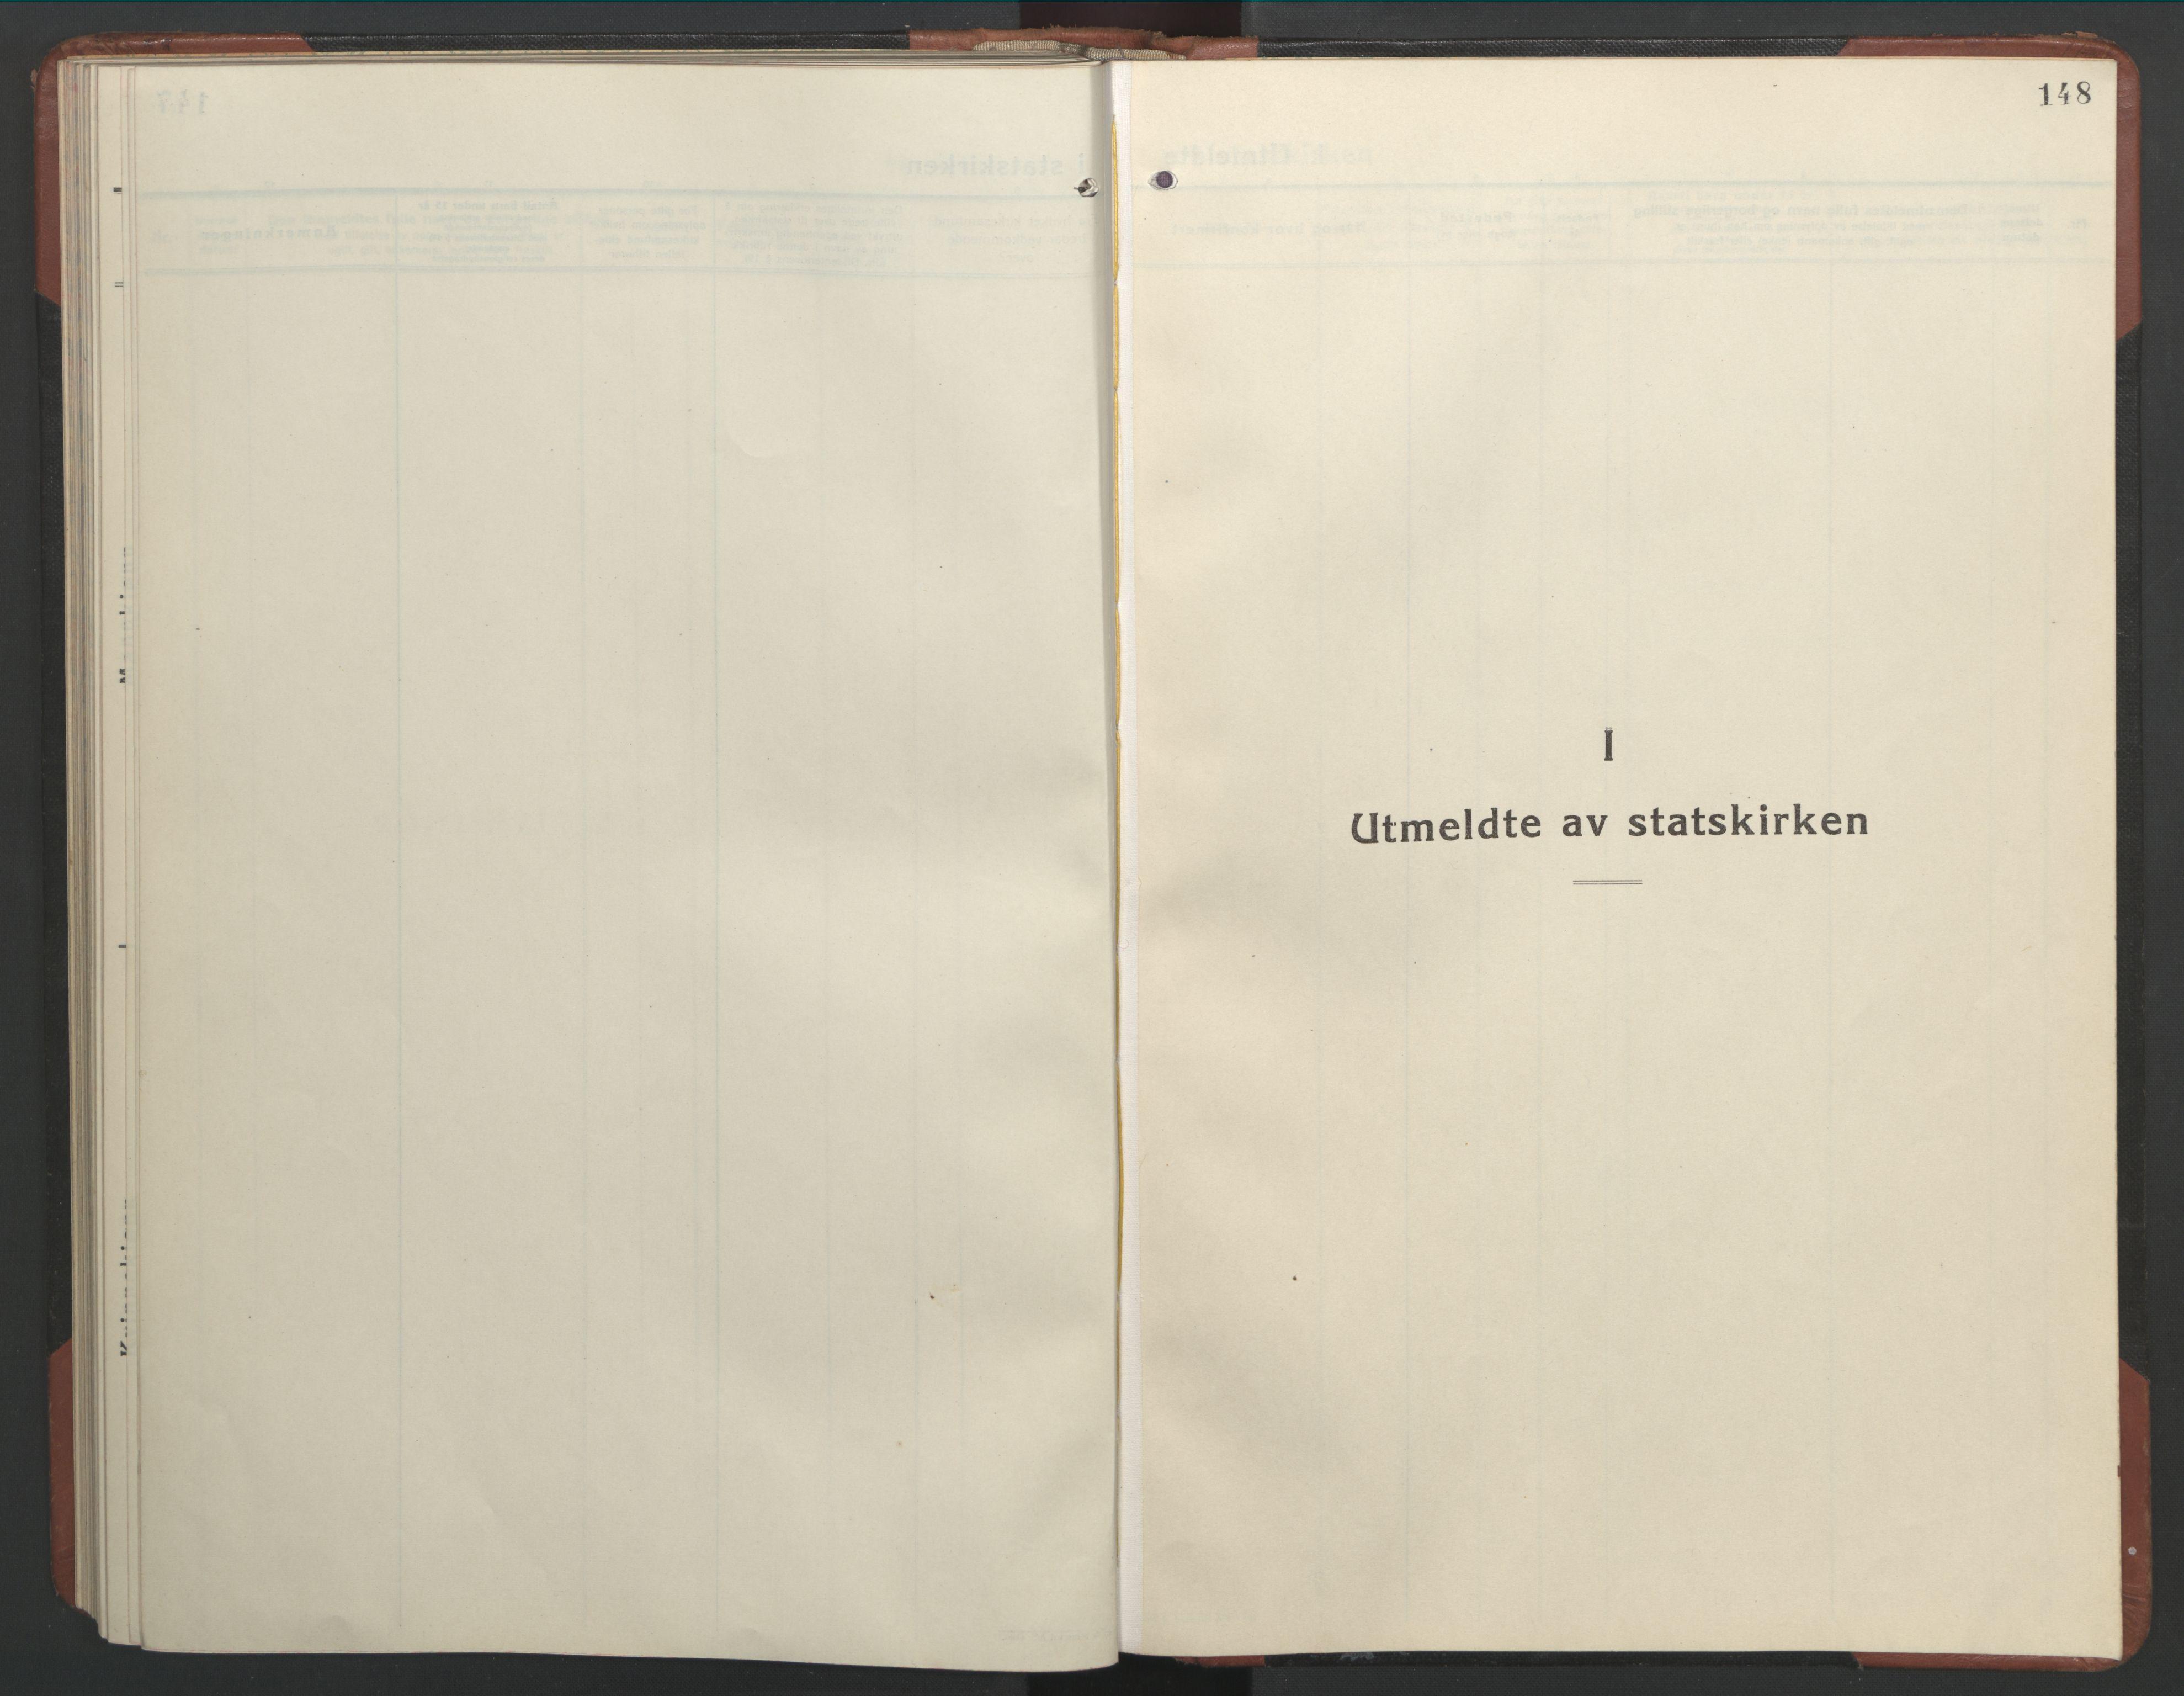 SAT, Ministerialprotokoller, klokkerbøker og fødselsregistre - Nordland, 803/L0078: Klokkerbok nr. 803C05, 1931-1952, s. 148